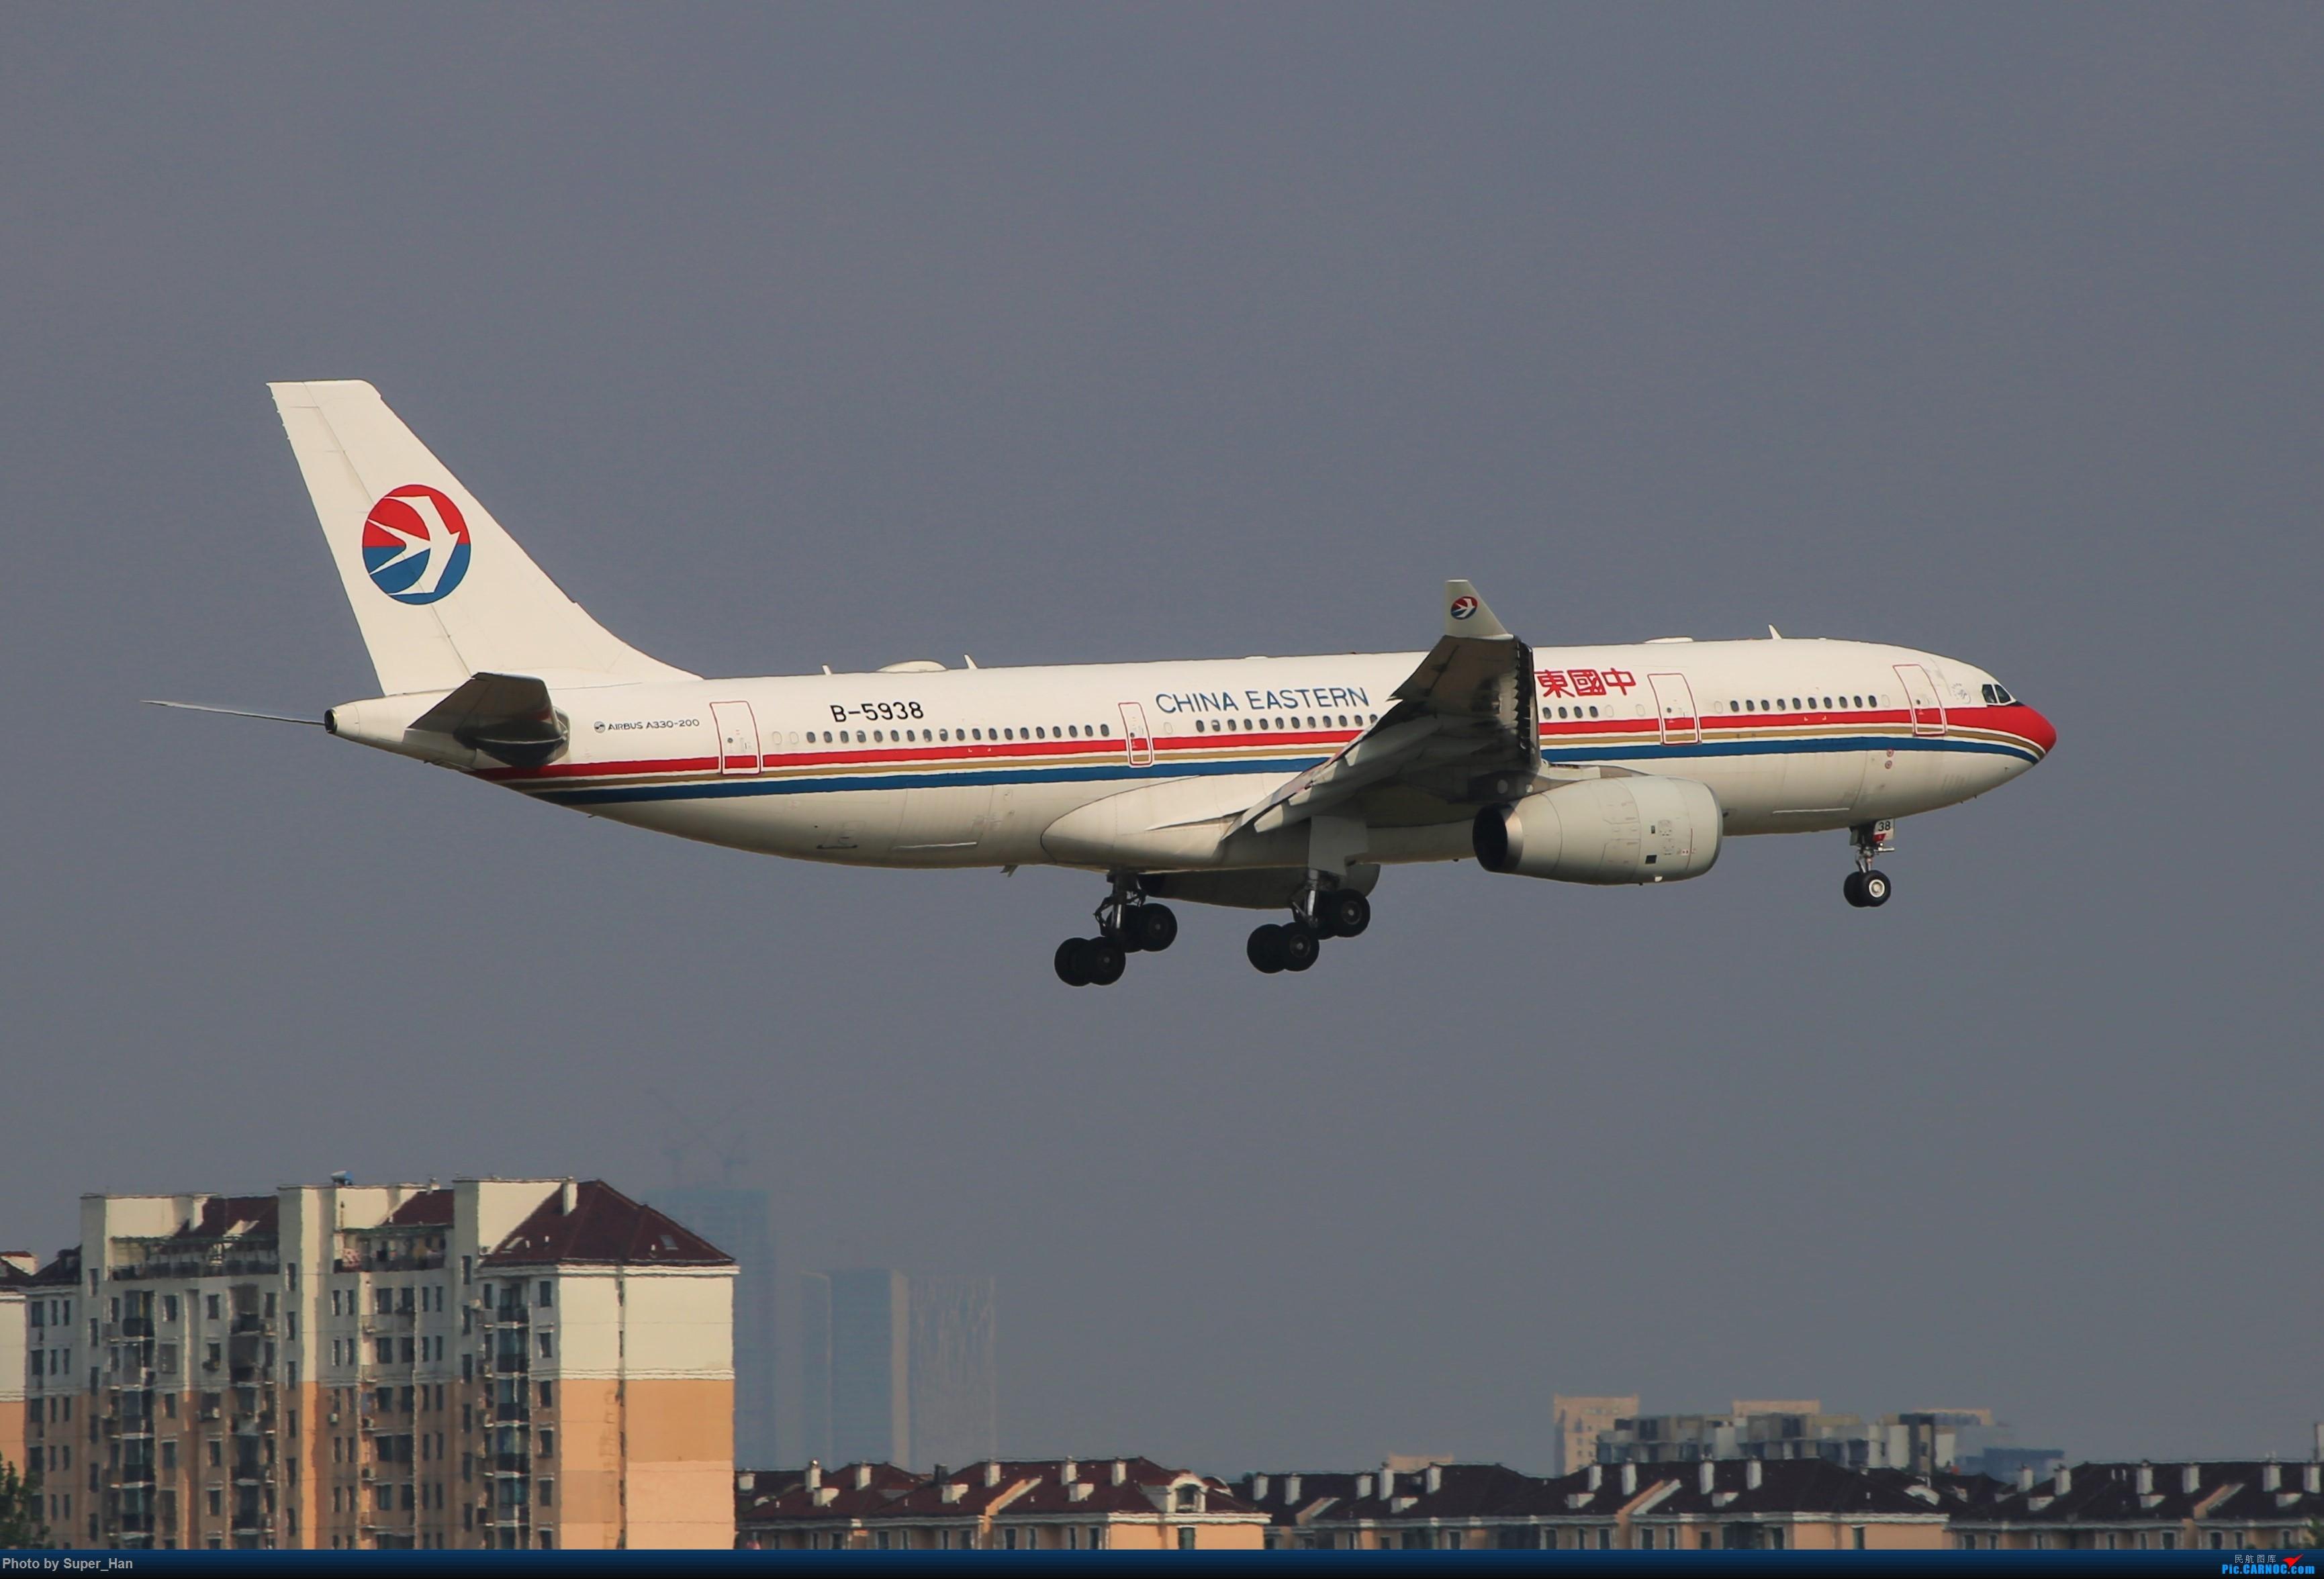 Re:[原创]0715去虹桥说走就走【最多的330篇】 AIRBUS A330-200 B-5938 中国上海虹桥国际机场